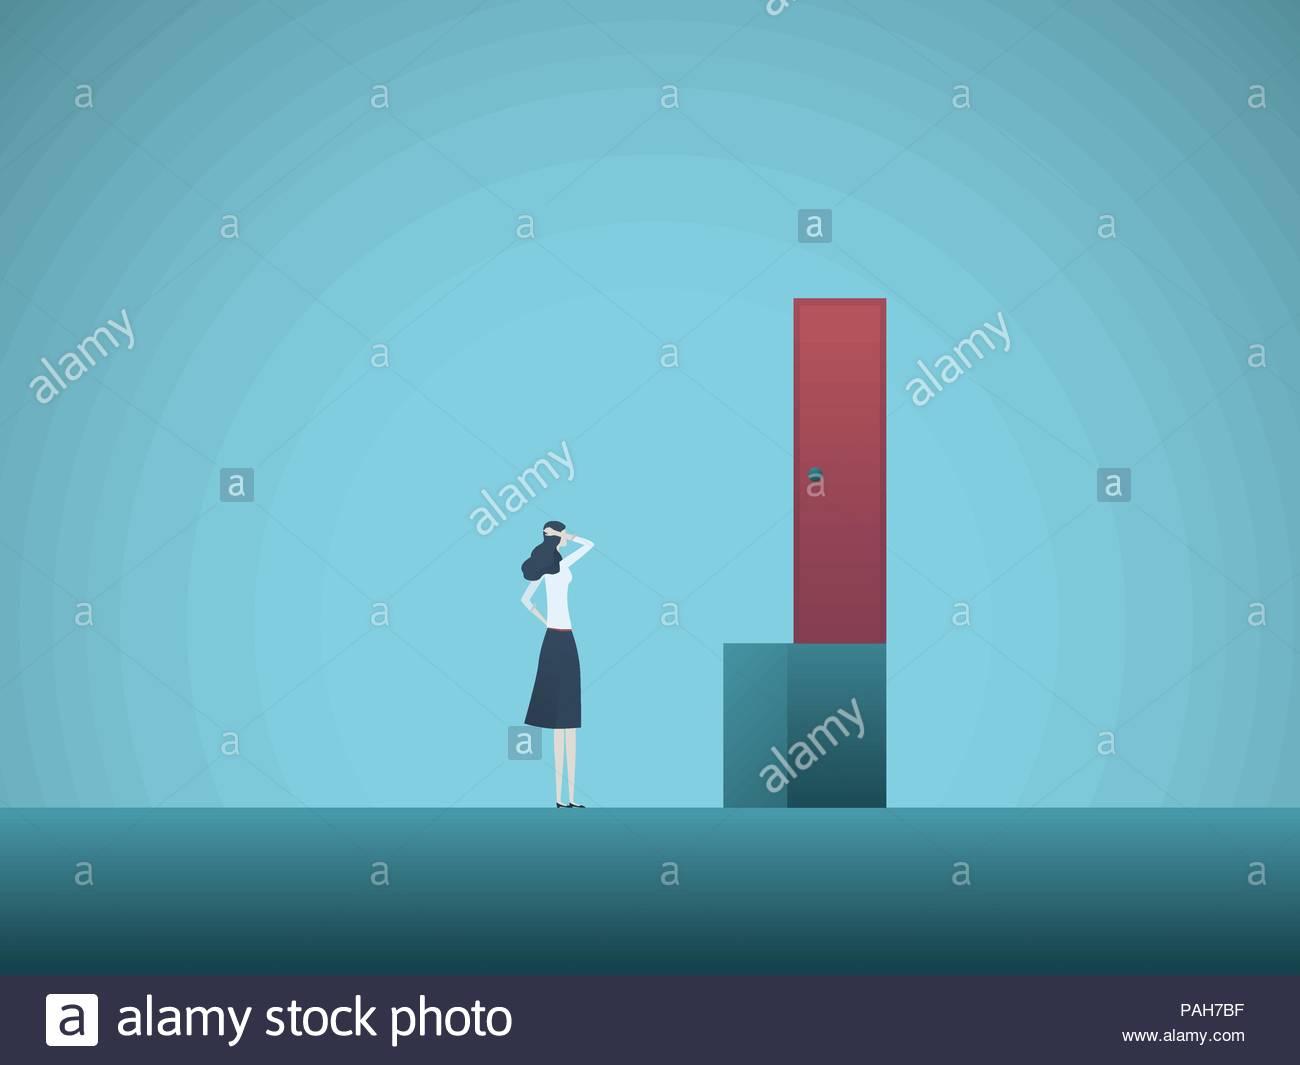 Business Woman Challenge Vector Conept Businesswoman Finding